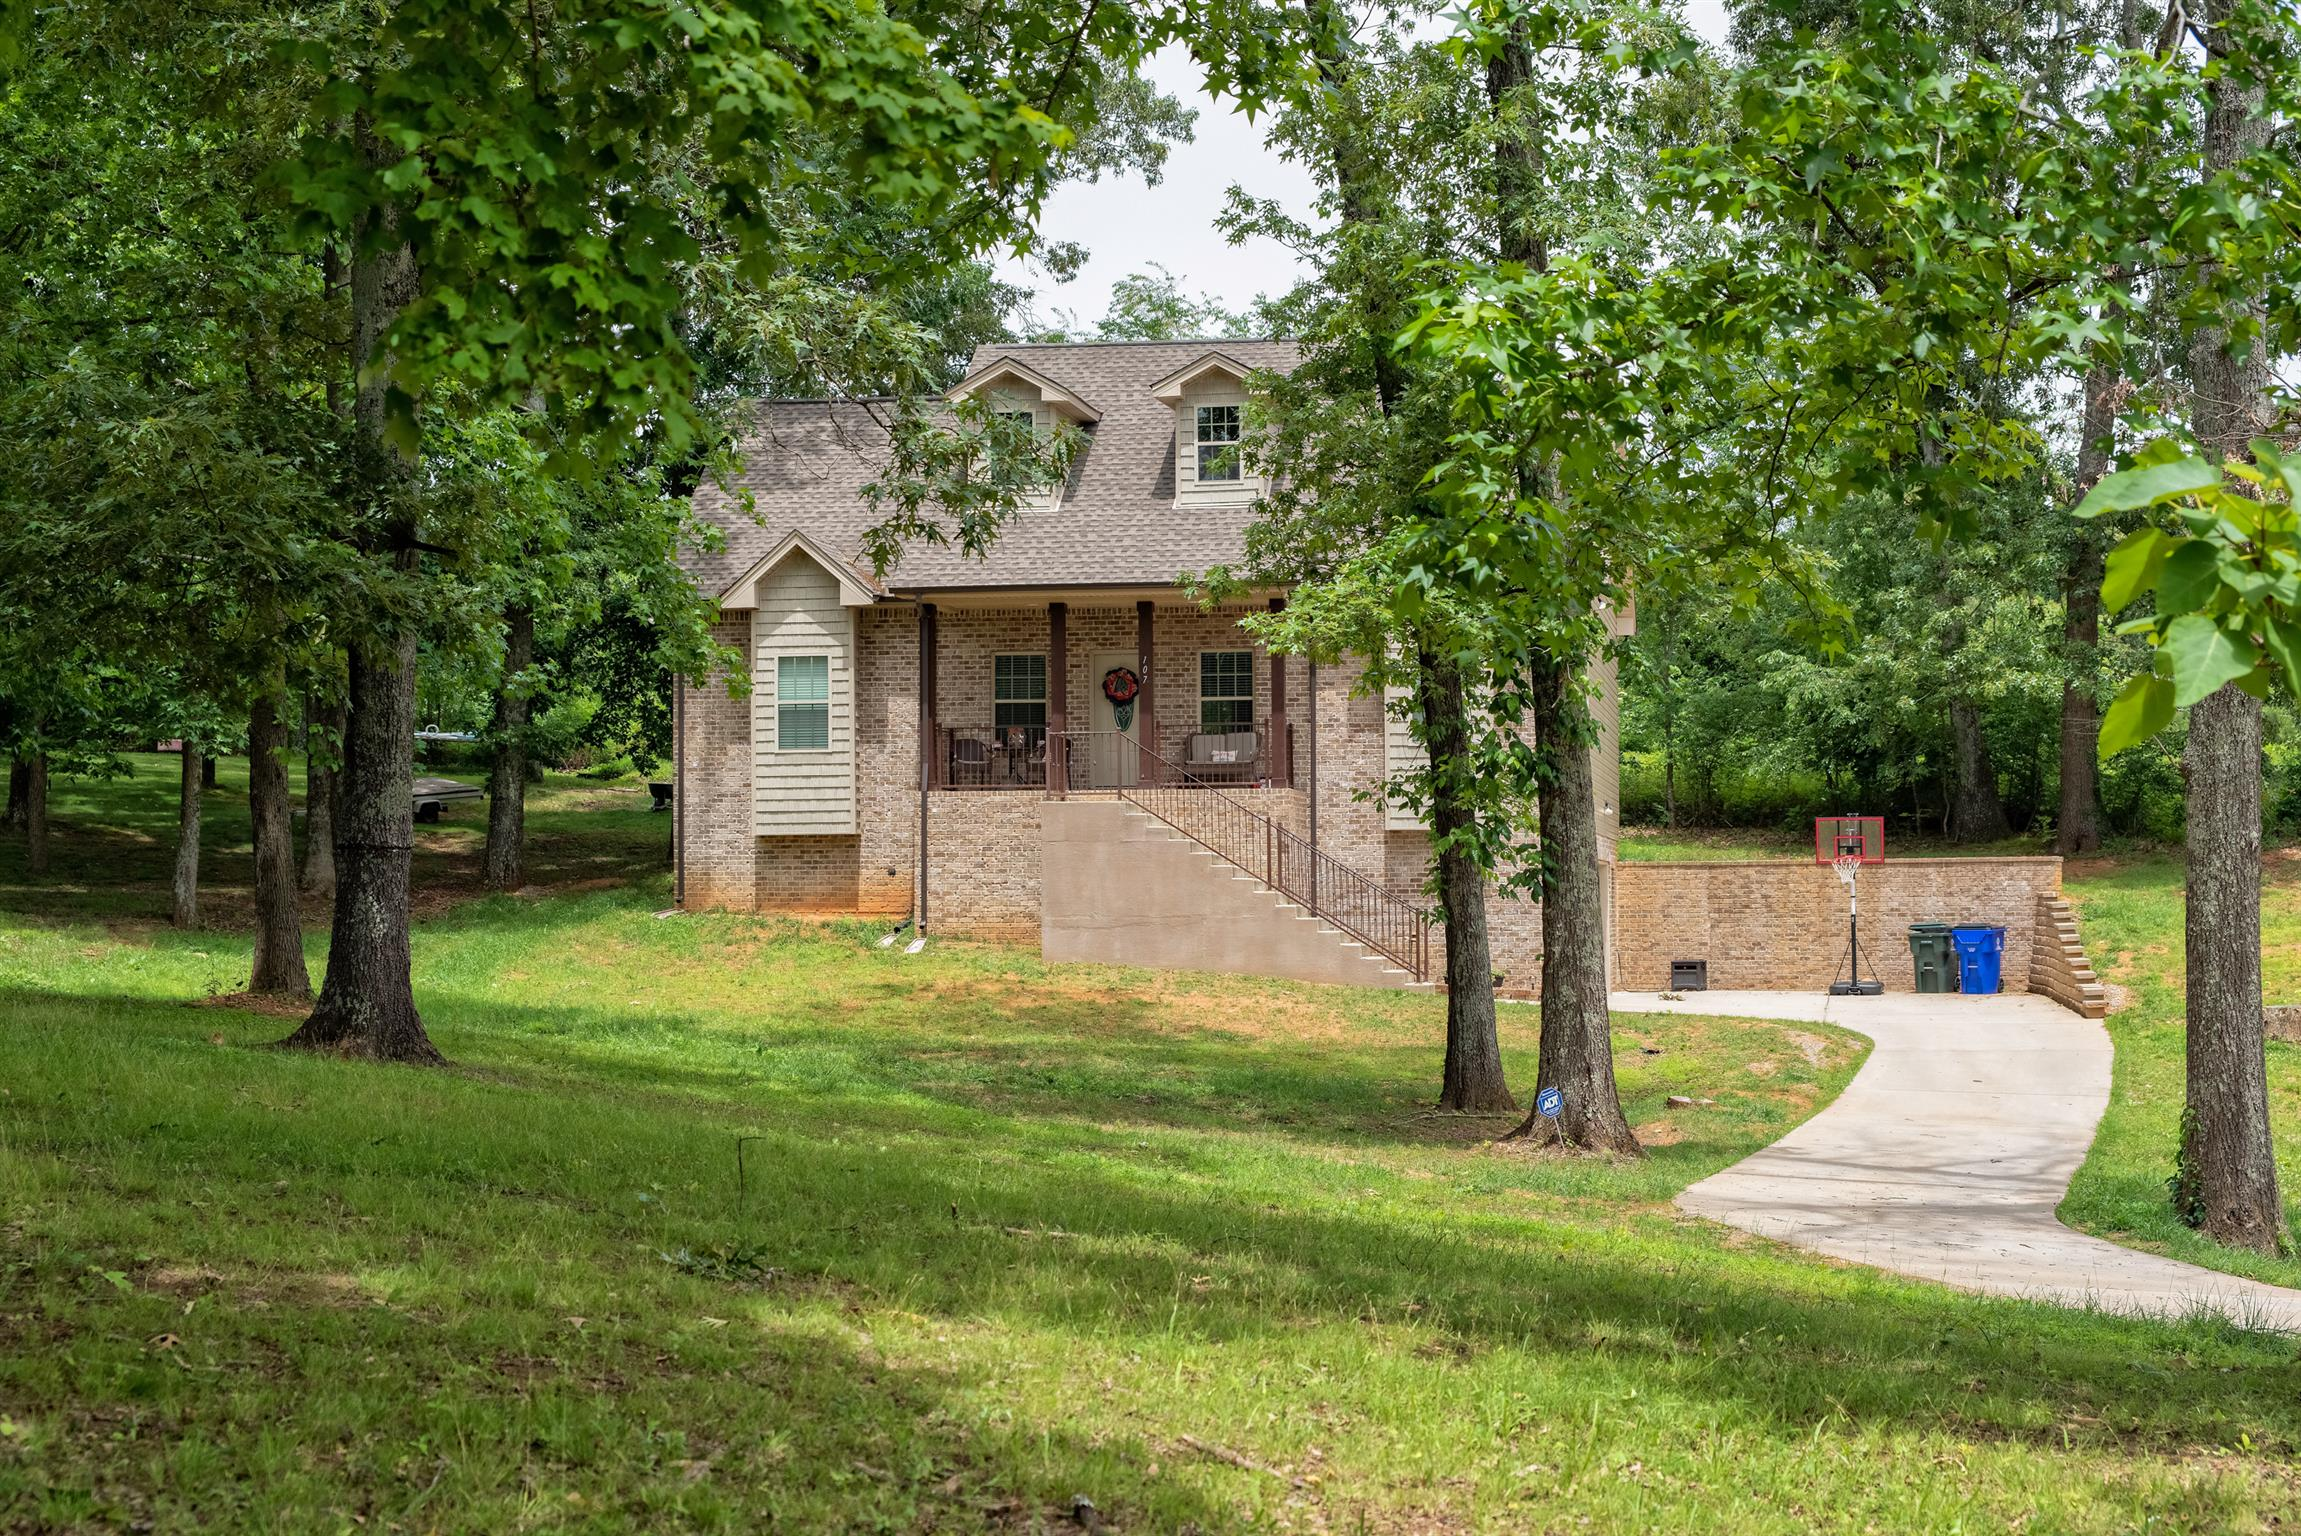 107 N Carson Ct, White House, TN 37188 - White House, TN real estate listing